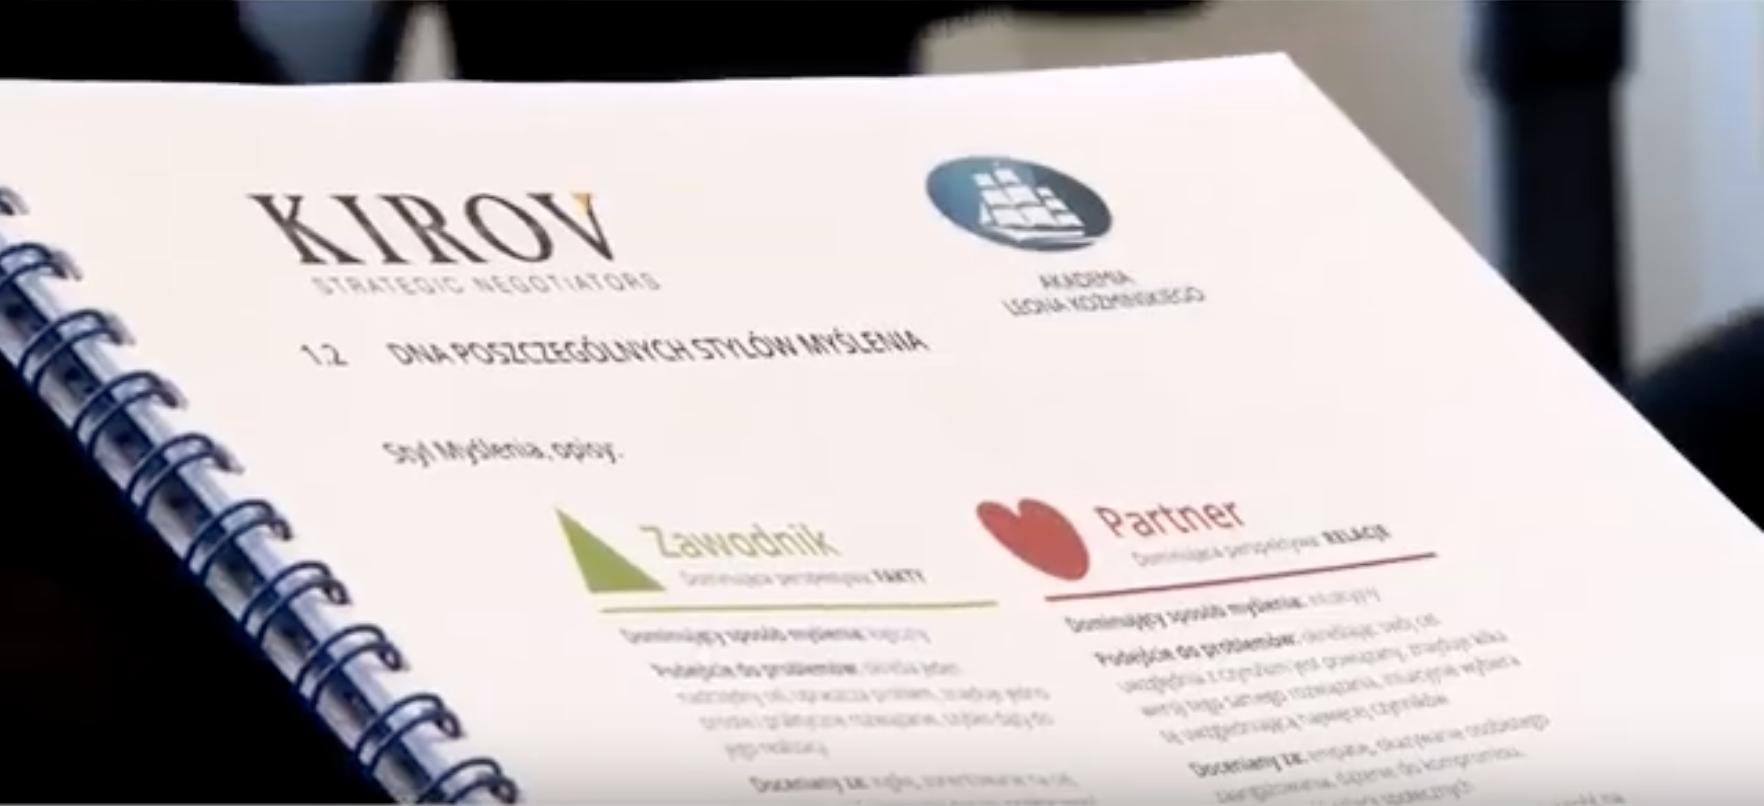 """Kirov & Partners"" film – Nikolay Kirov, Nadia Kirova, Iwona Bobrowska Budny"